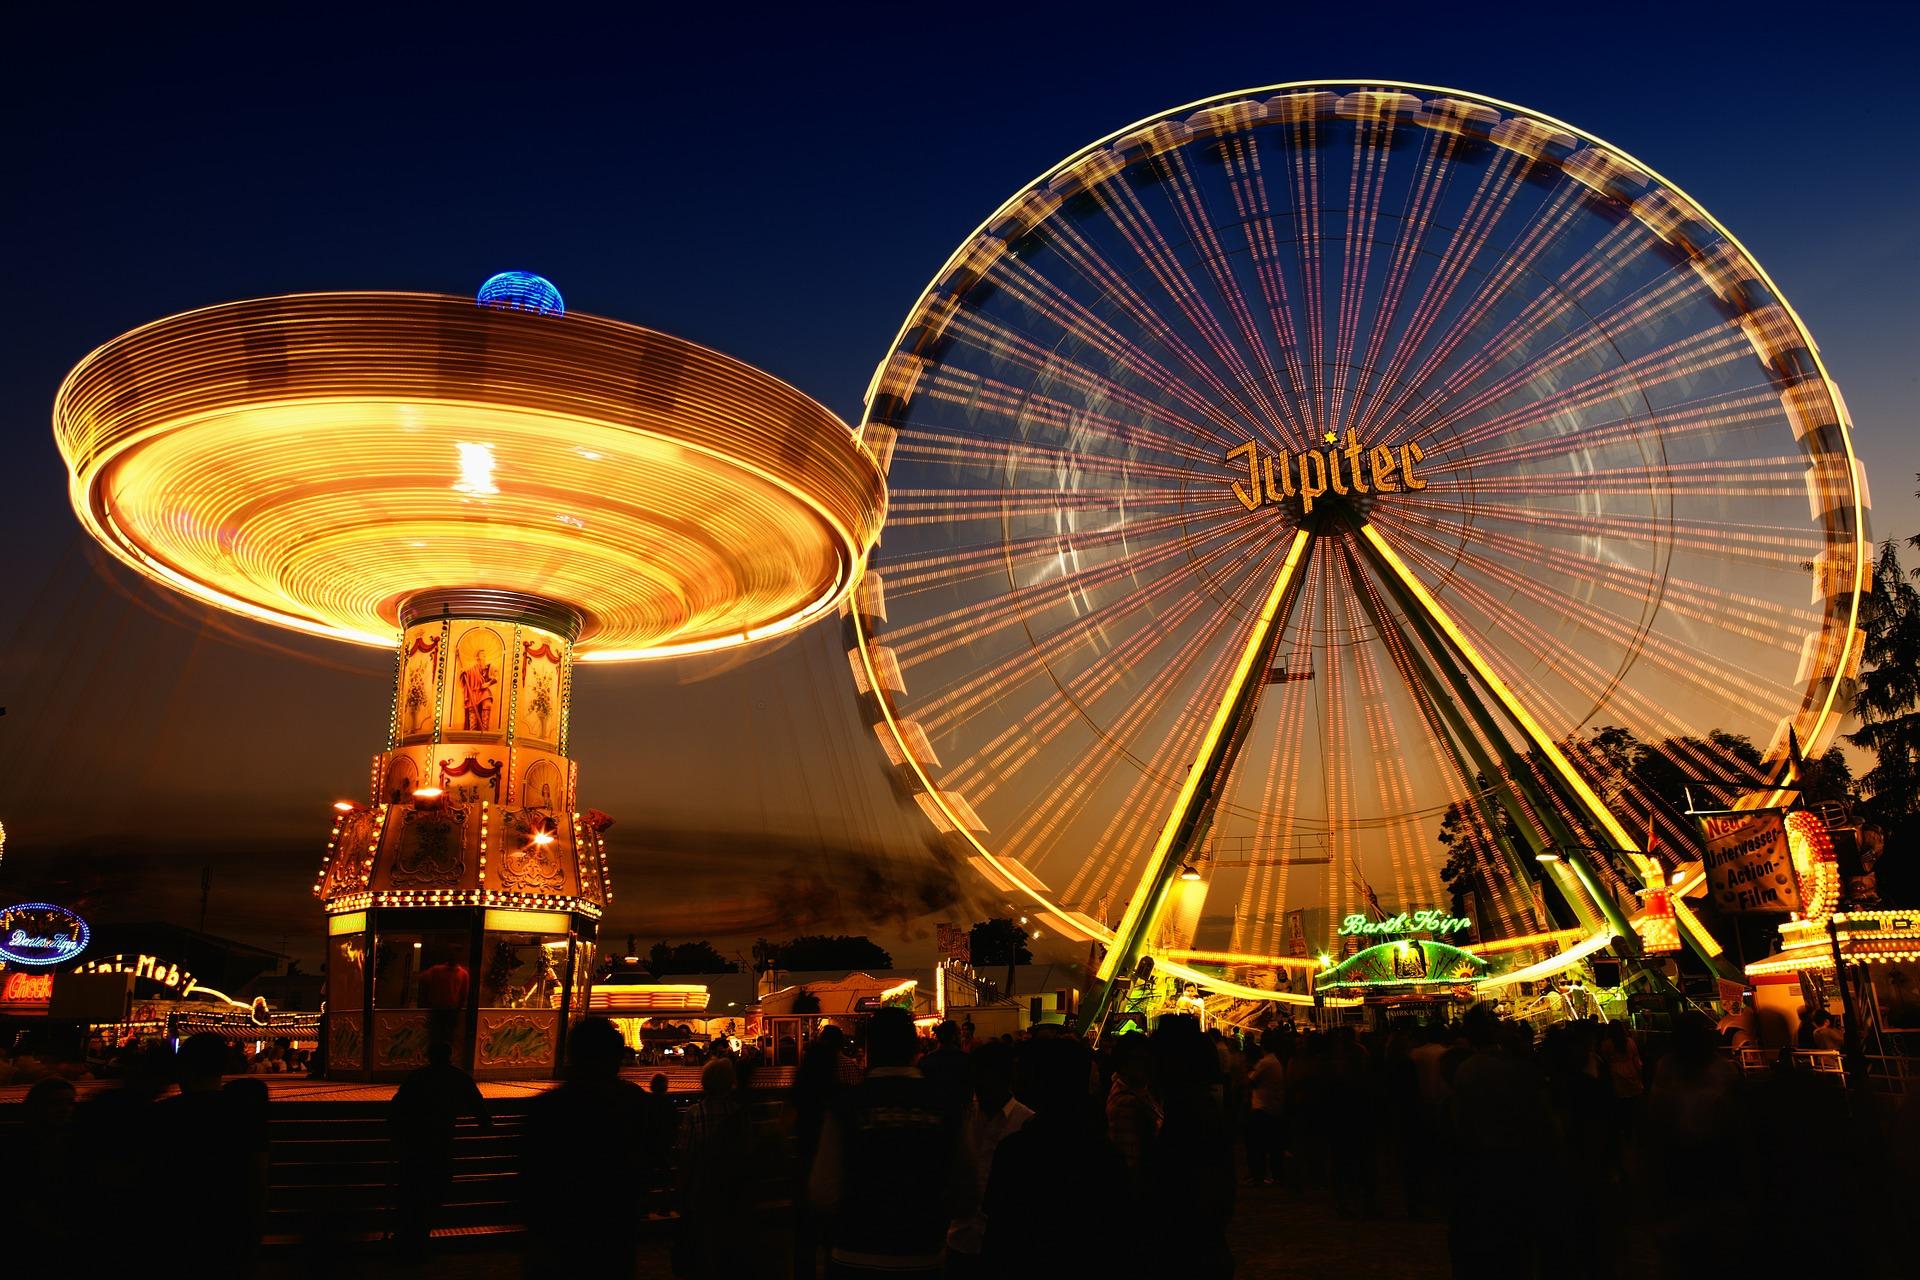 Volksfest mit Riesenrad. -- Bild: Frank Winkler / Pixbay